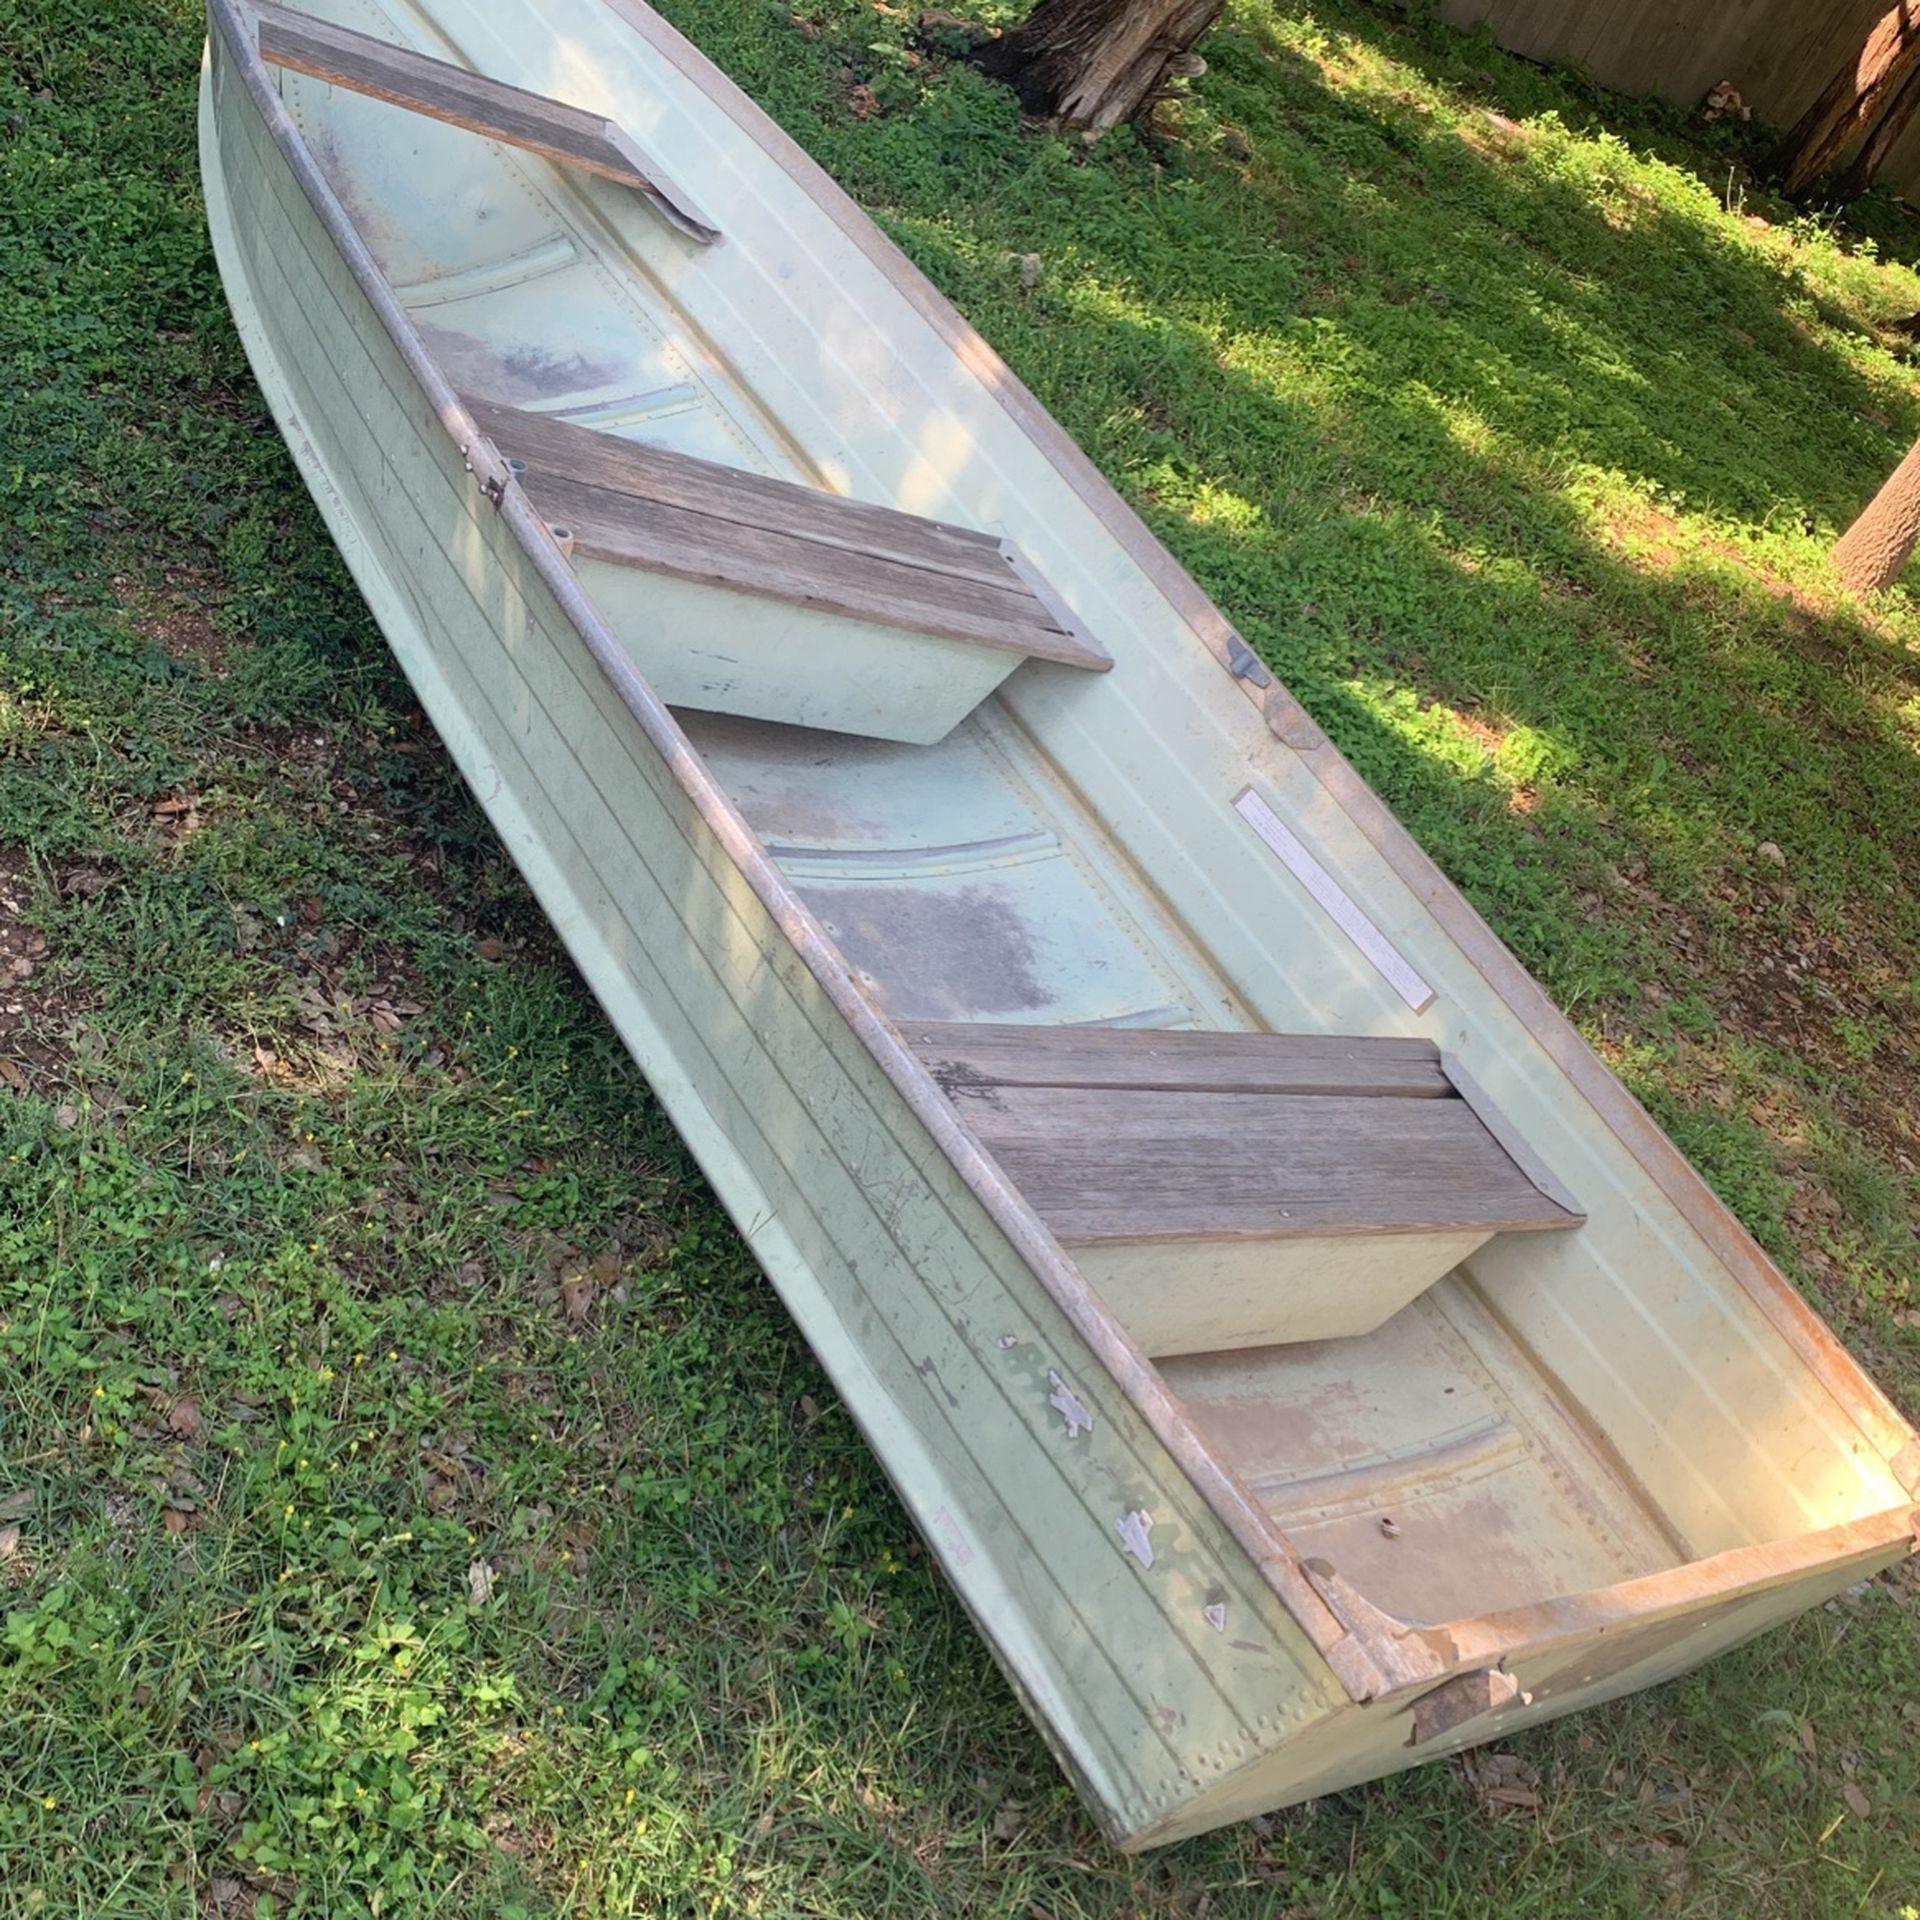 Photo Starcraft Aluminum Boat 14 Foot